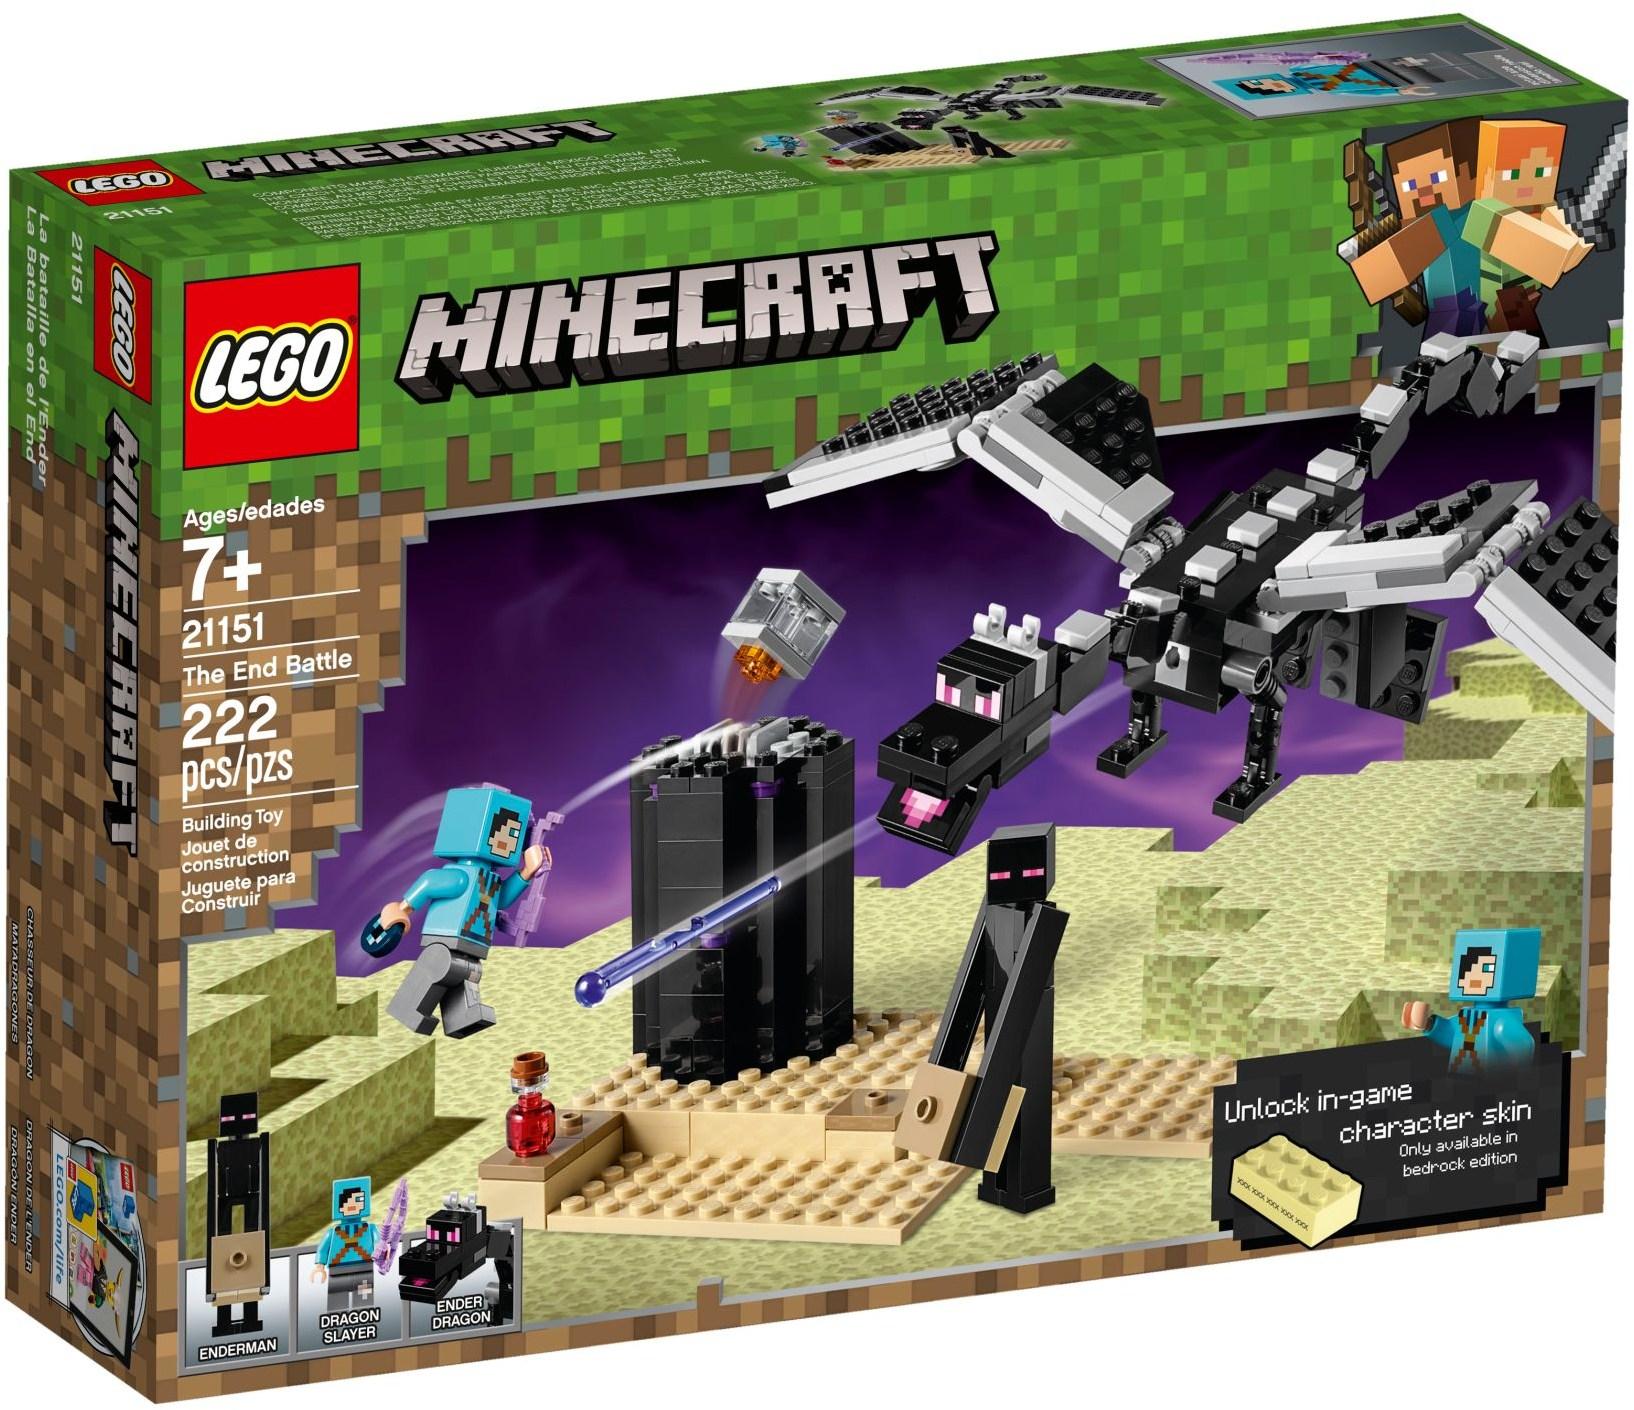 Lego Minecraft 21151 The End Battle Teton Toys Now you can have more fun in minecraft! lego minecraft 21151 the end battle